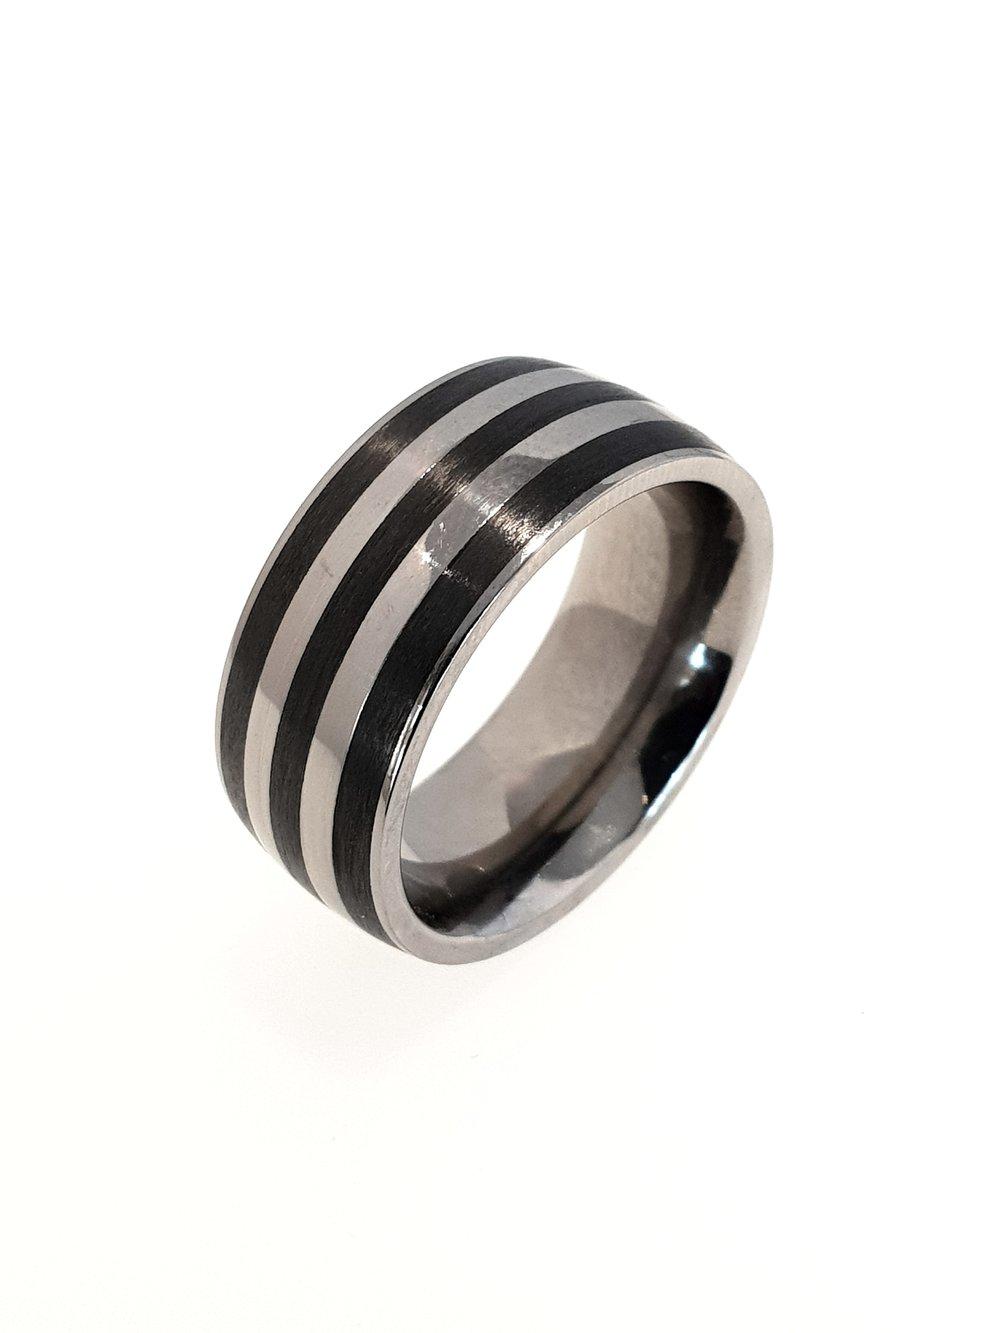 Carbon Fibre & Titanium Ring    Titan Factory (Model: 52484/000/000/050)   Current Stock Size:  Stock Code: E9858  £135